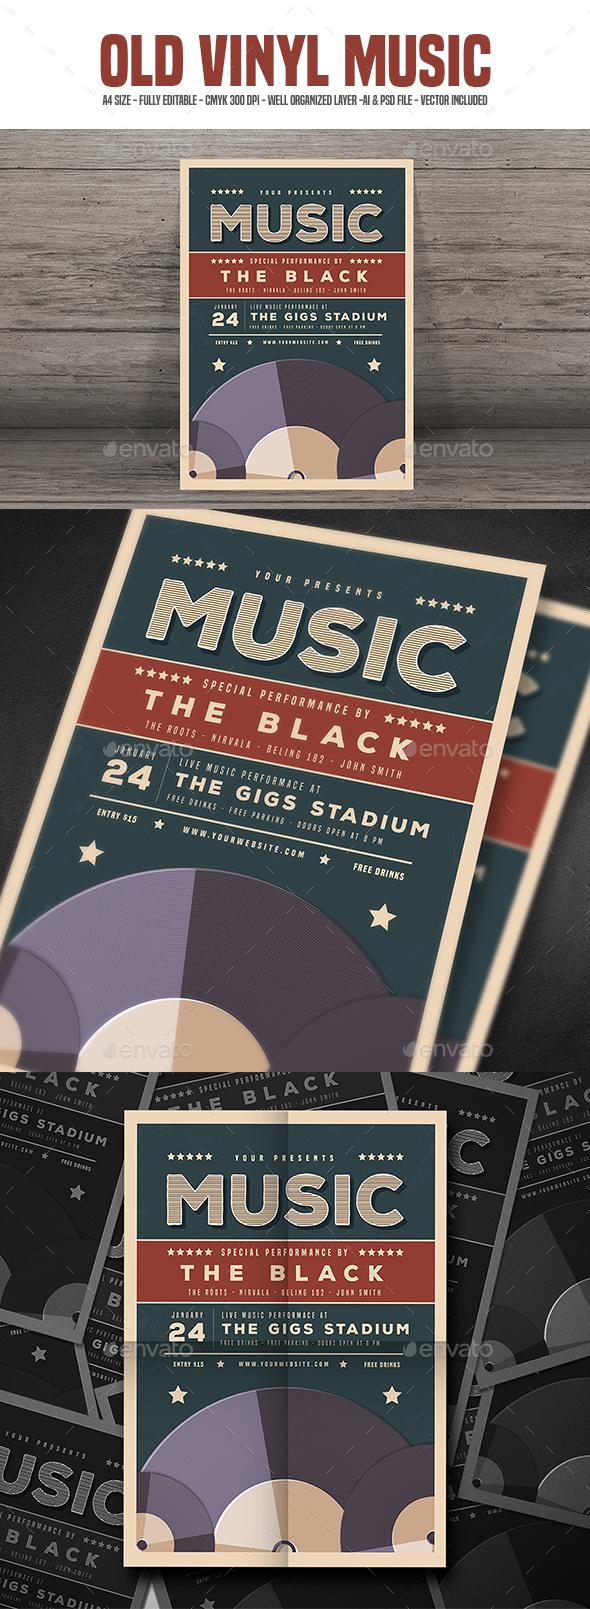 Old vinyl Music Flyer - Concerts Events